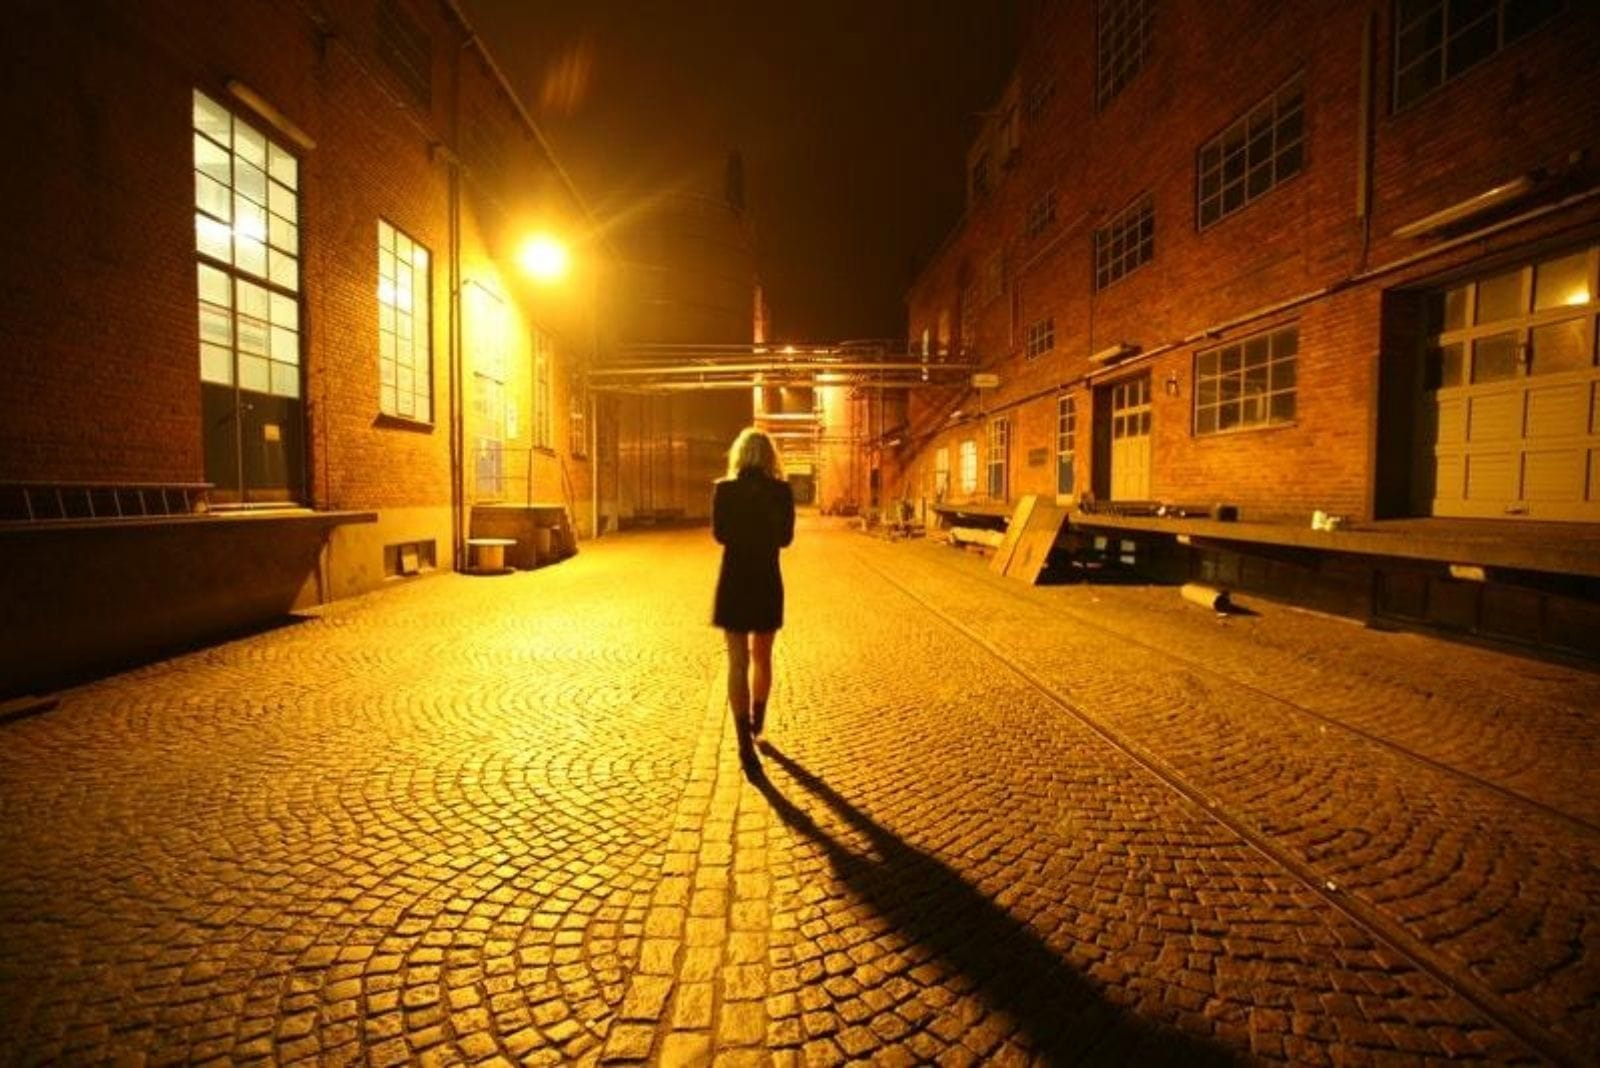 the woman walks down the street alone